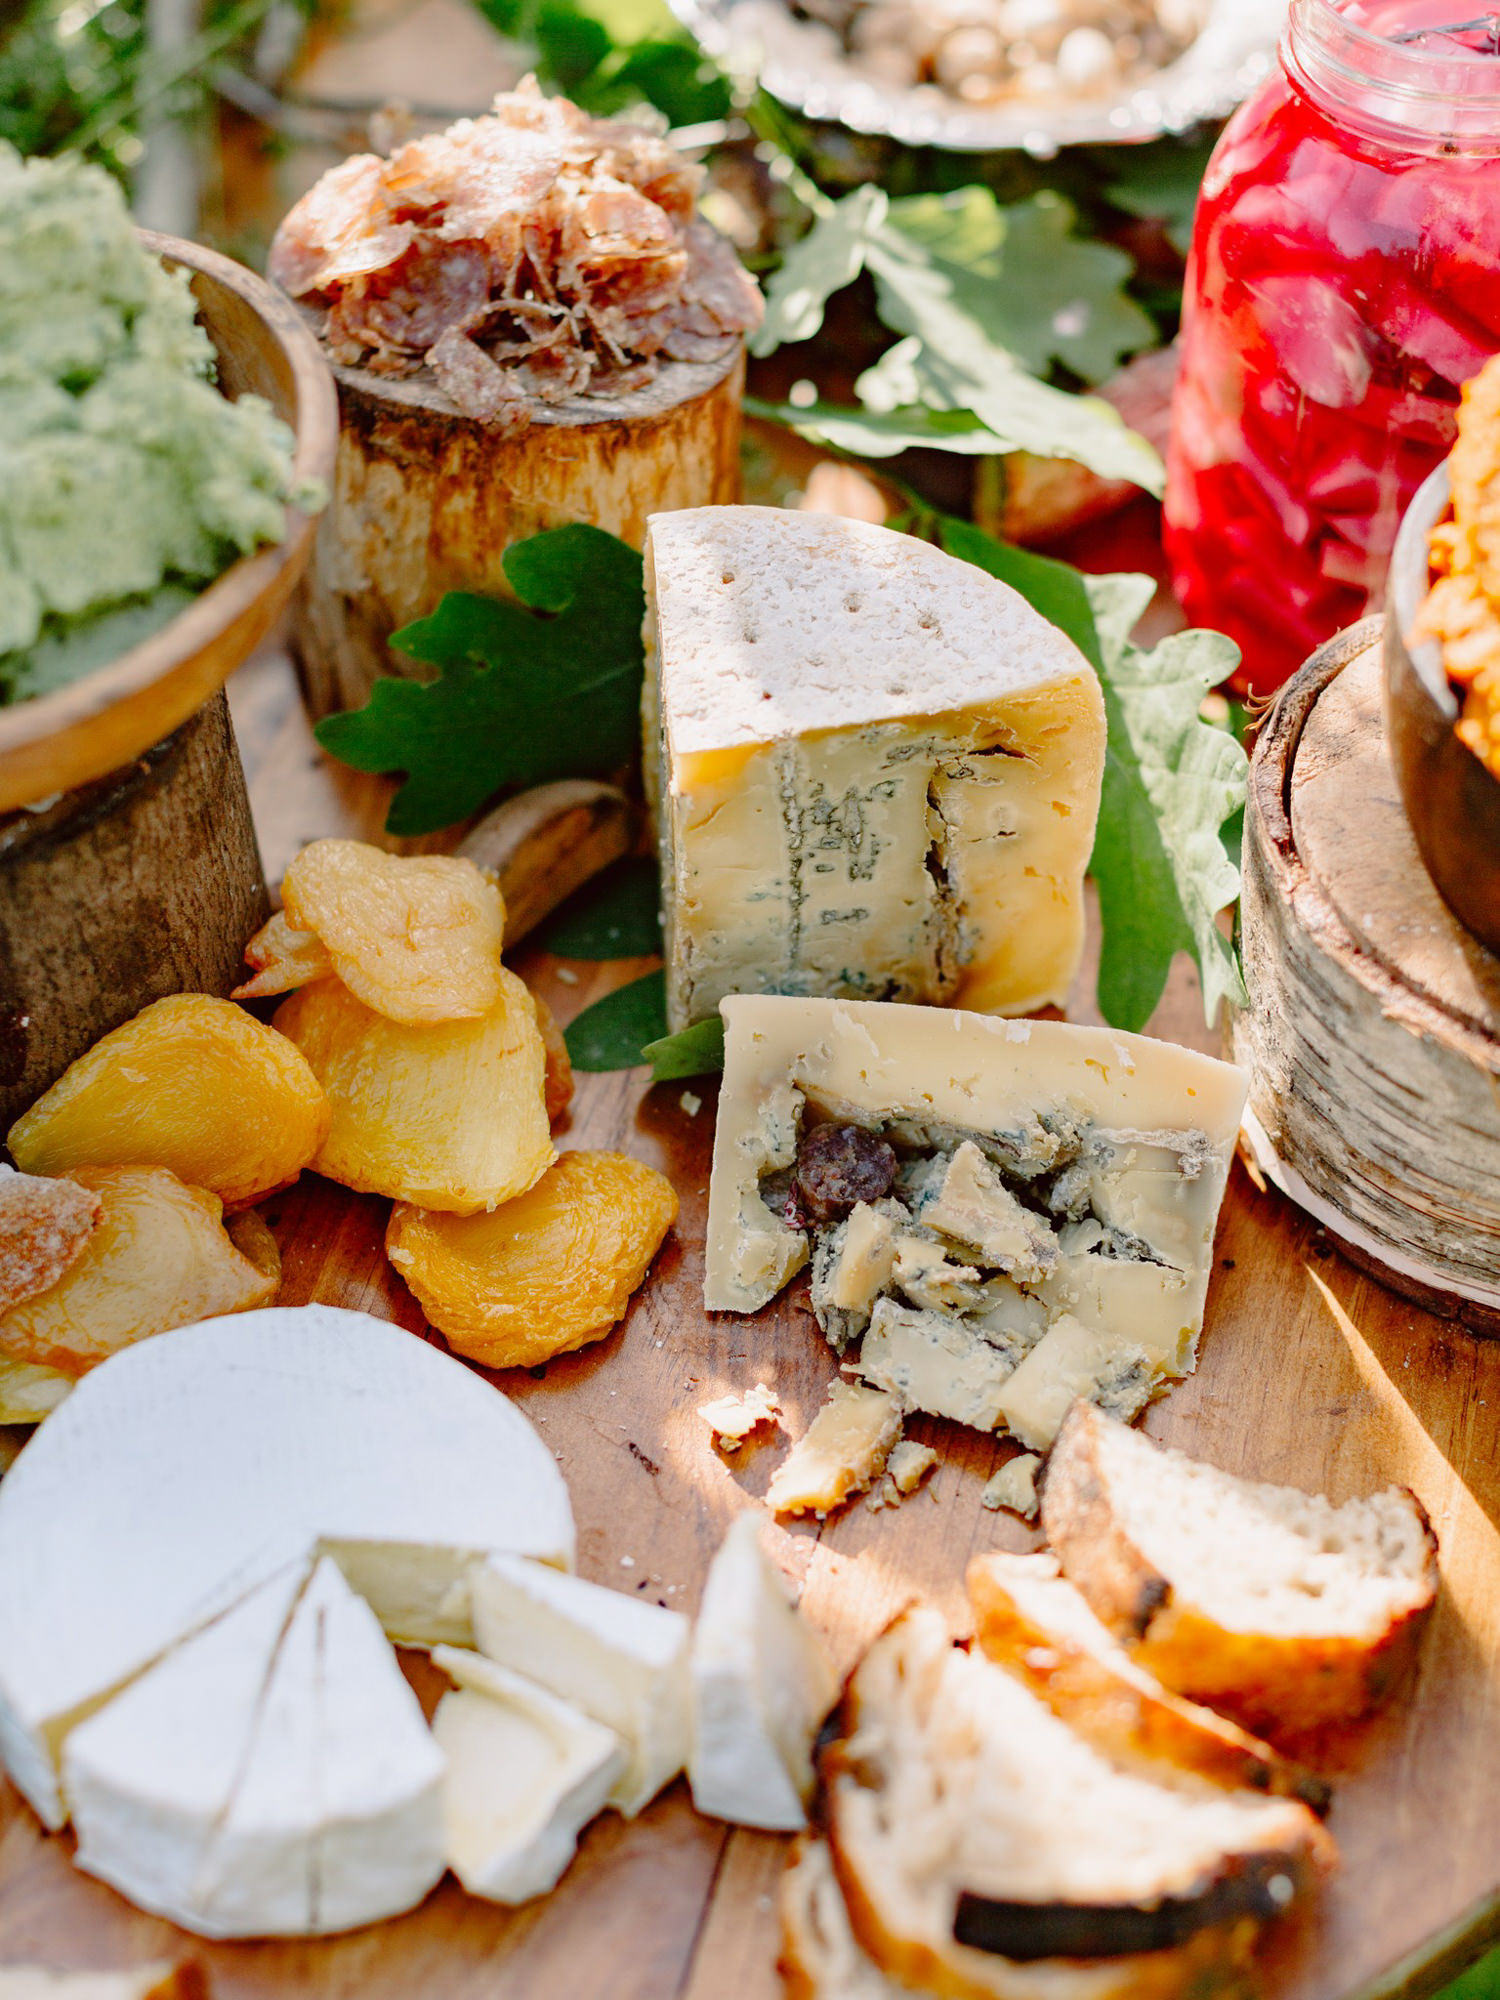 cheese-and-fruit-plate-worlds-best-wedding-photos-benj-haisch-seattle-wedding-photographers